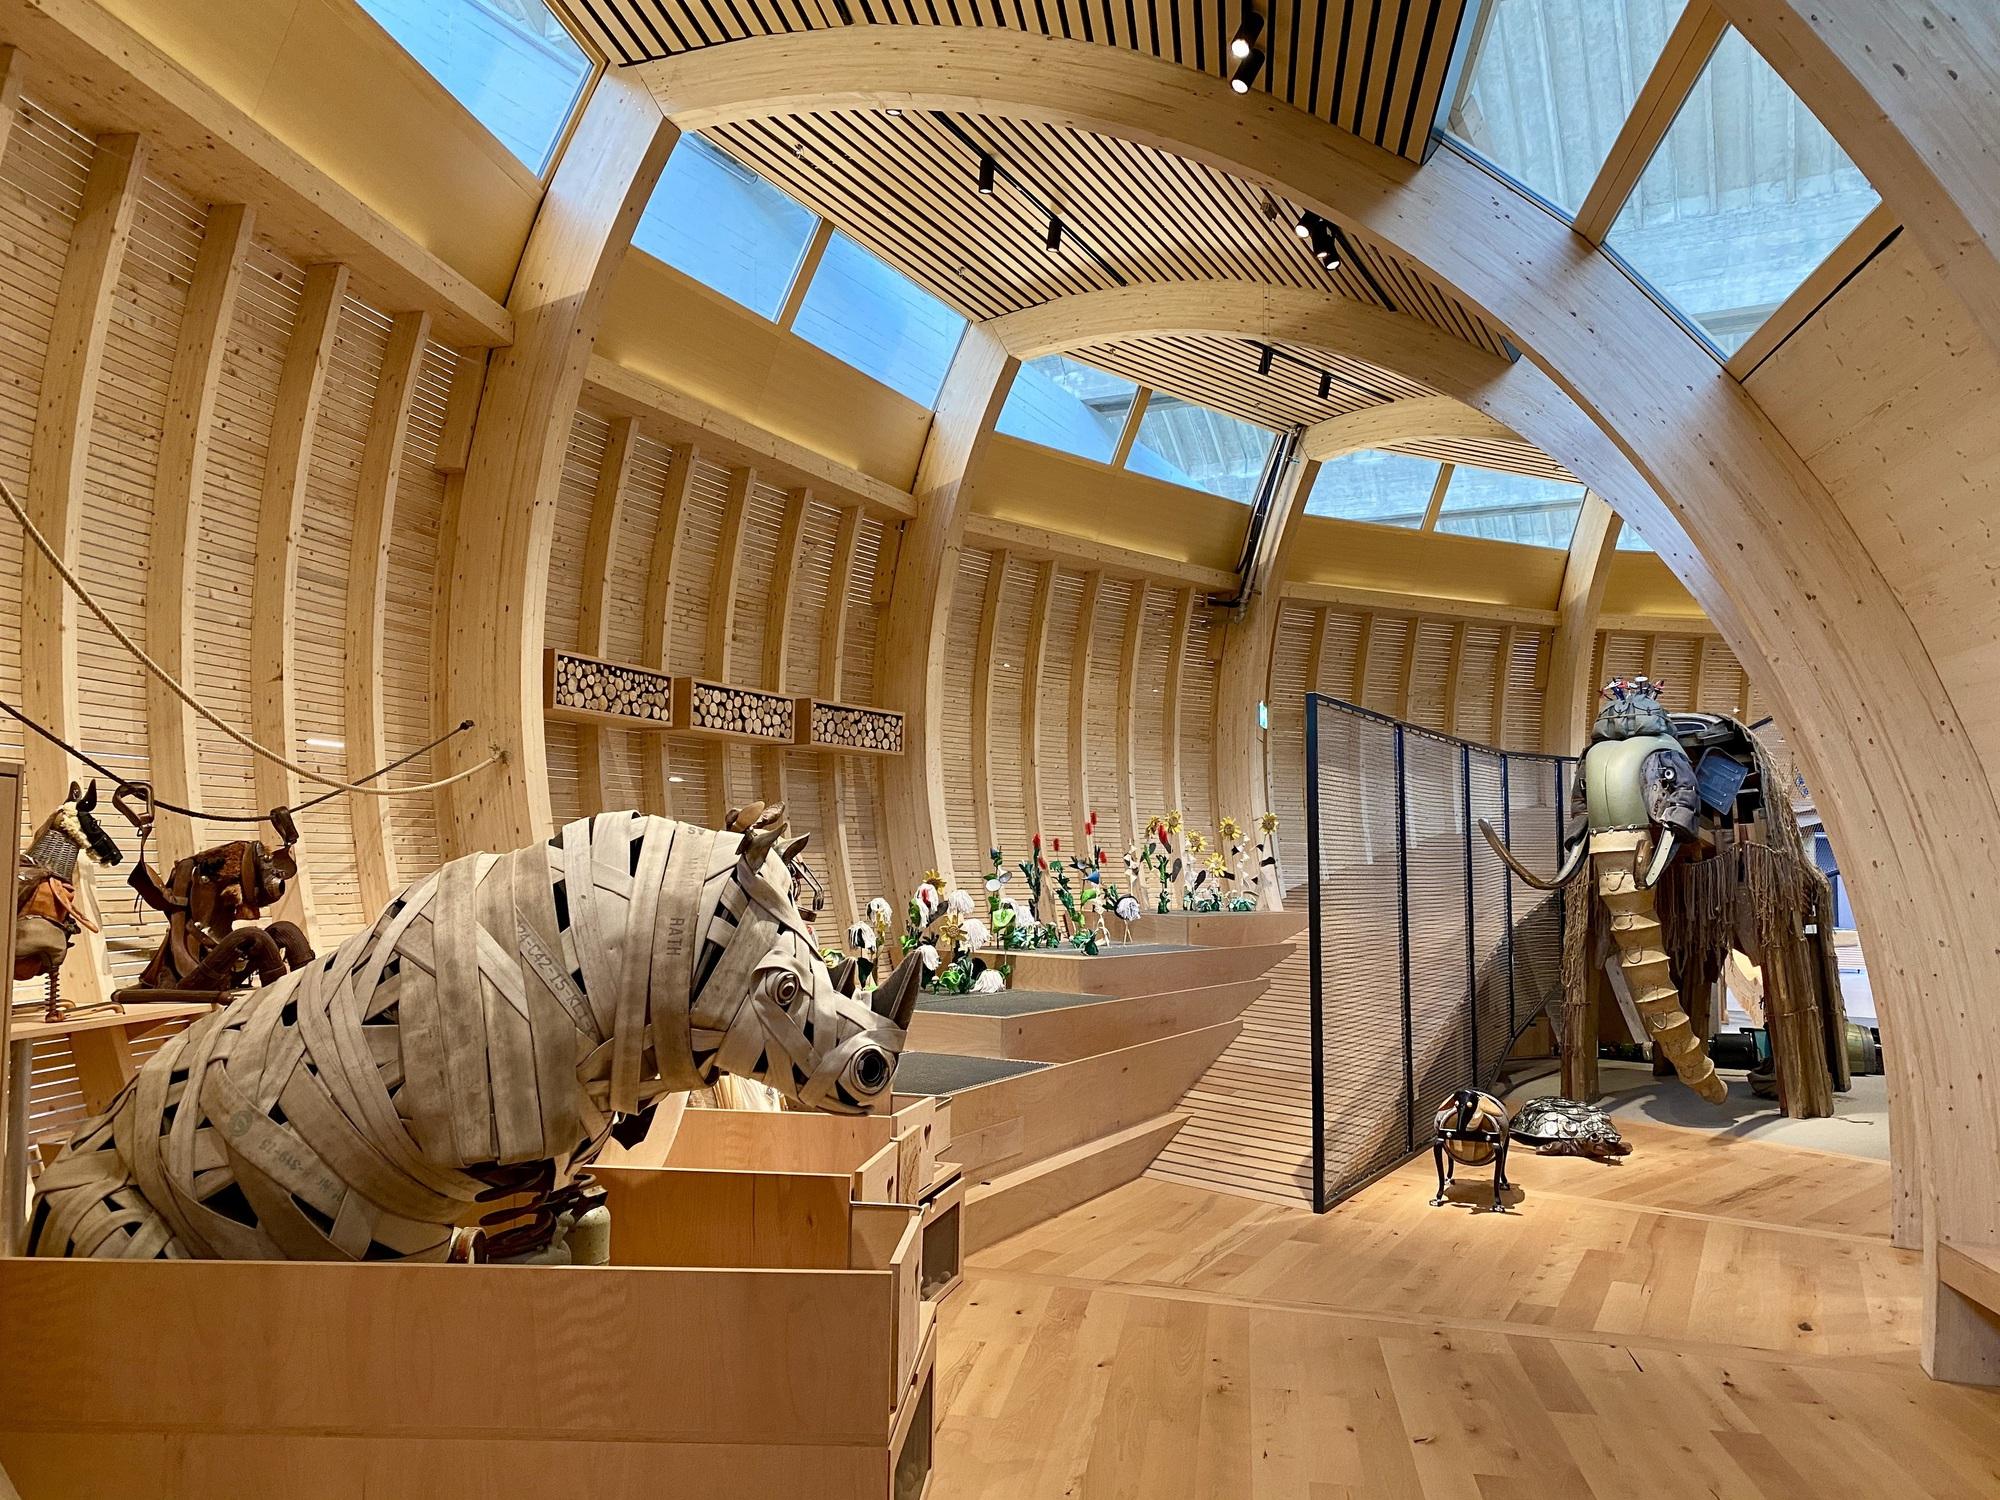 Olson Kundig Reinterprets Noah's Ark for Children's Experience at the Jewish Museum in Berlin